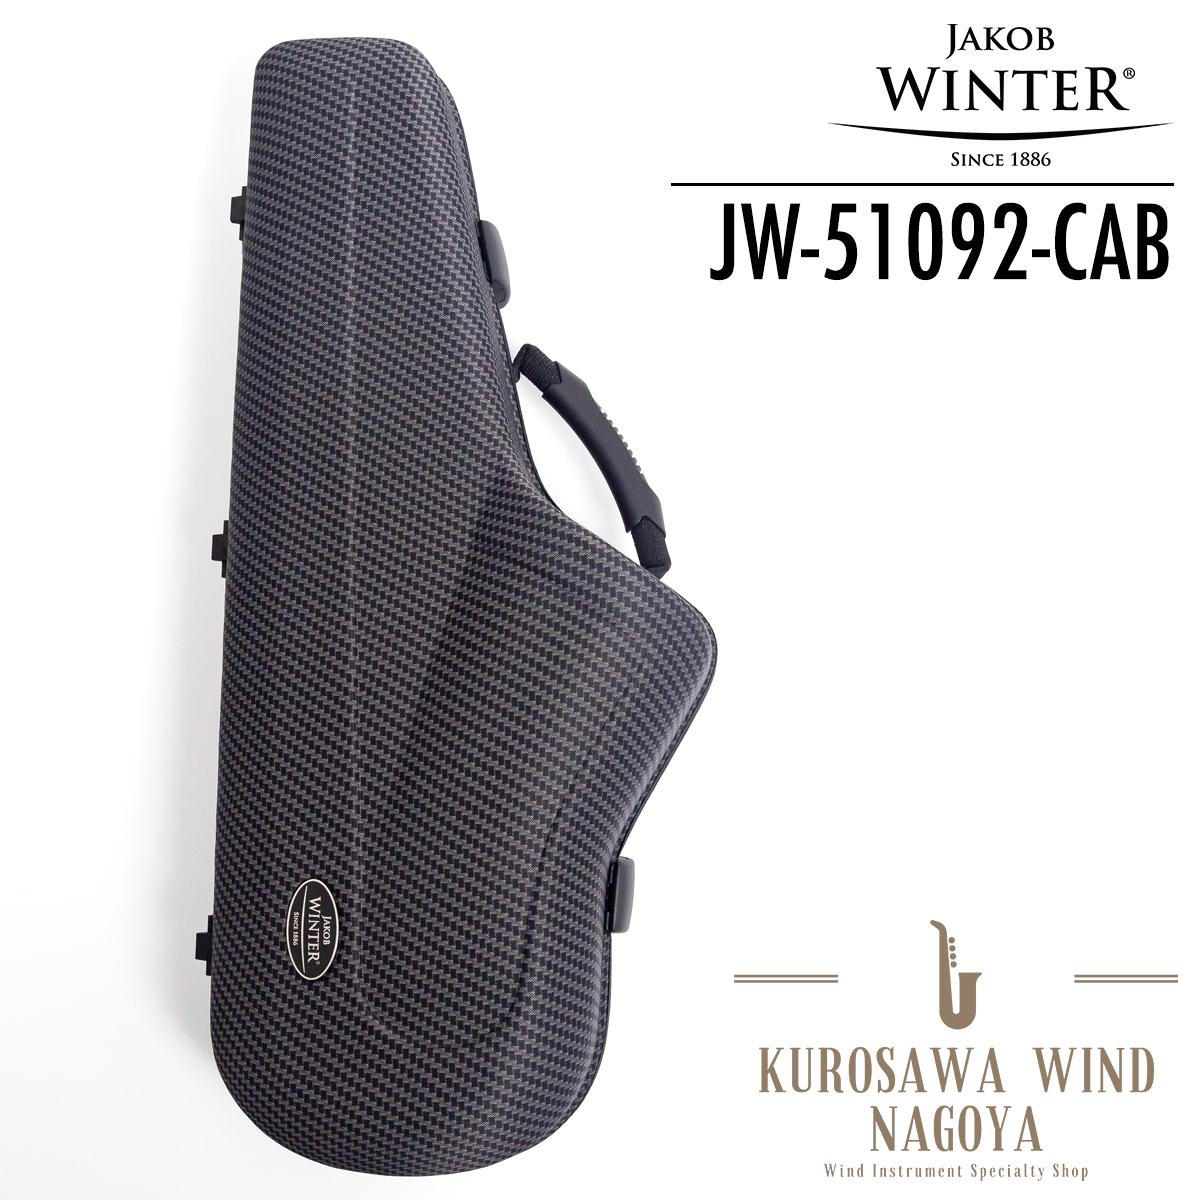 "JAKOB WINTER JW51092 SHAPED CASE ""GREENLINE"" CAB ALTO【ヤコブ・ヴィンター】【アルトサックスケース】【新品】【送料無料】【管楽器専門店】【Wind Nagoya】"